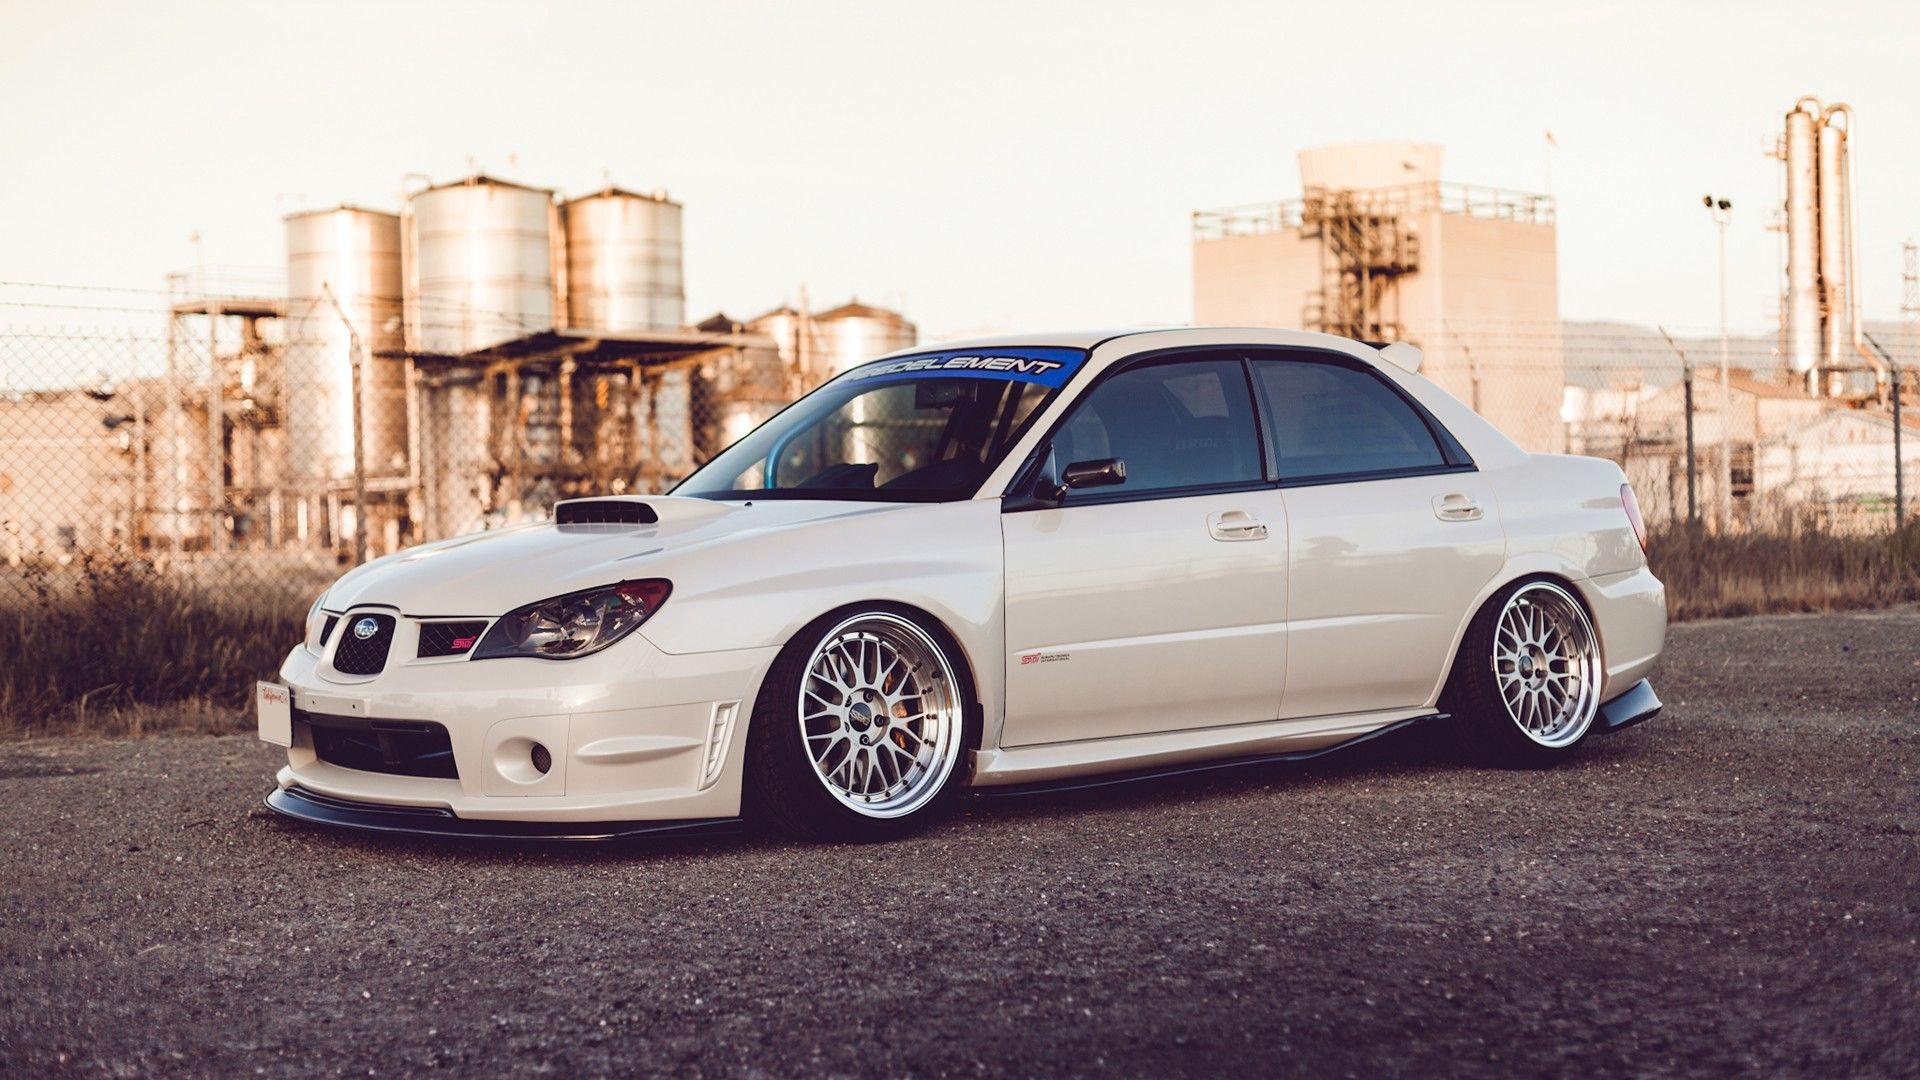 Subaru wrx jdm sti cars hd wallpaper - Subaru Subaru Impreza Wrx Sti Cars